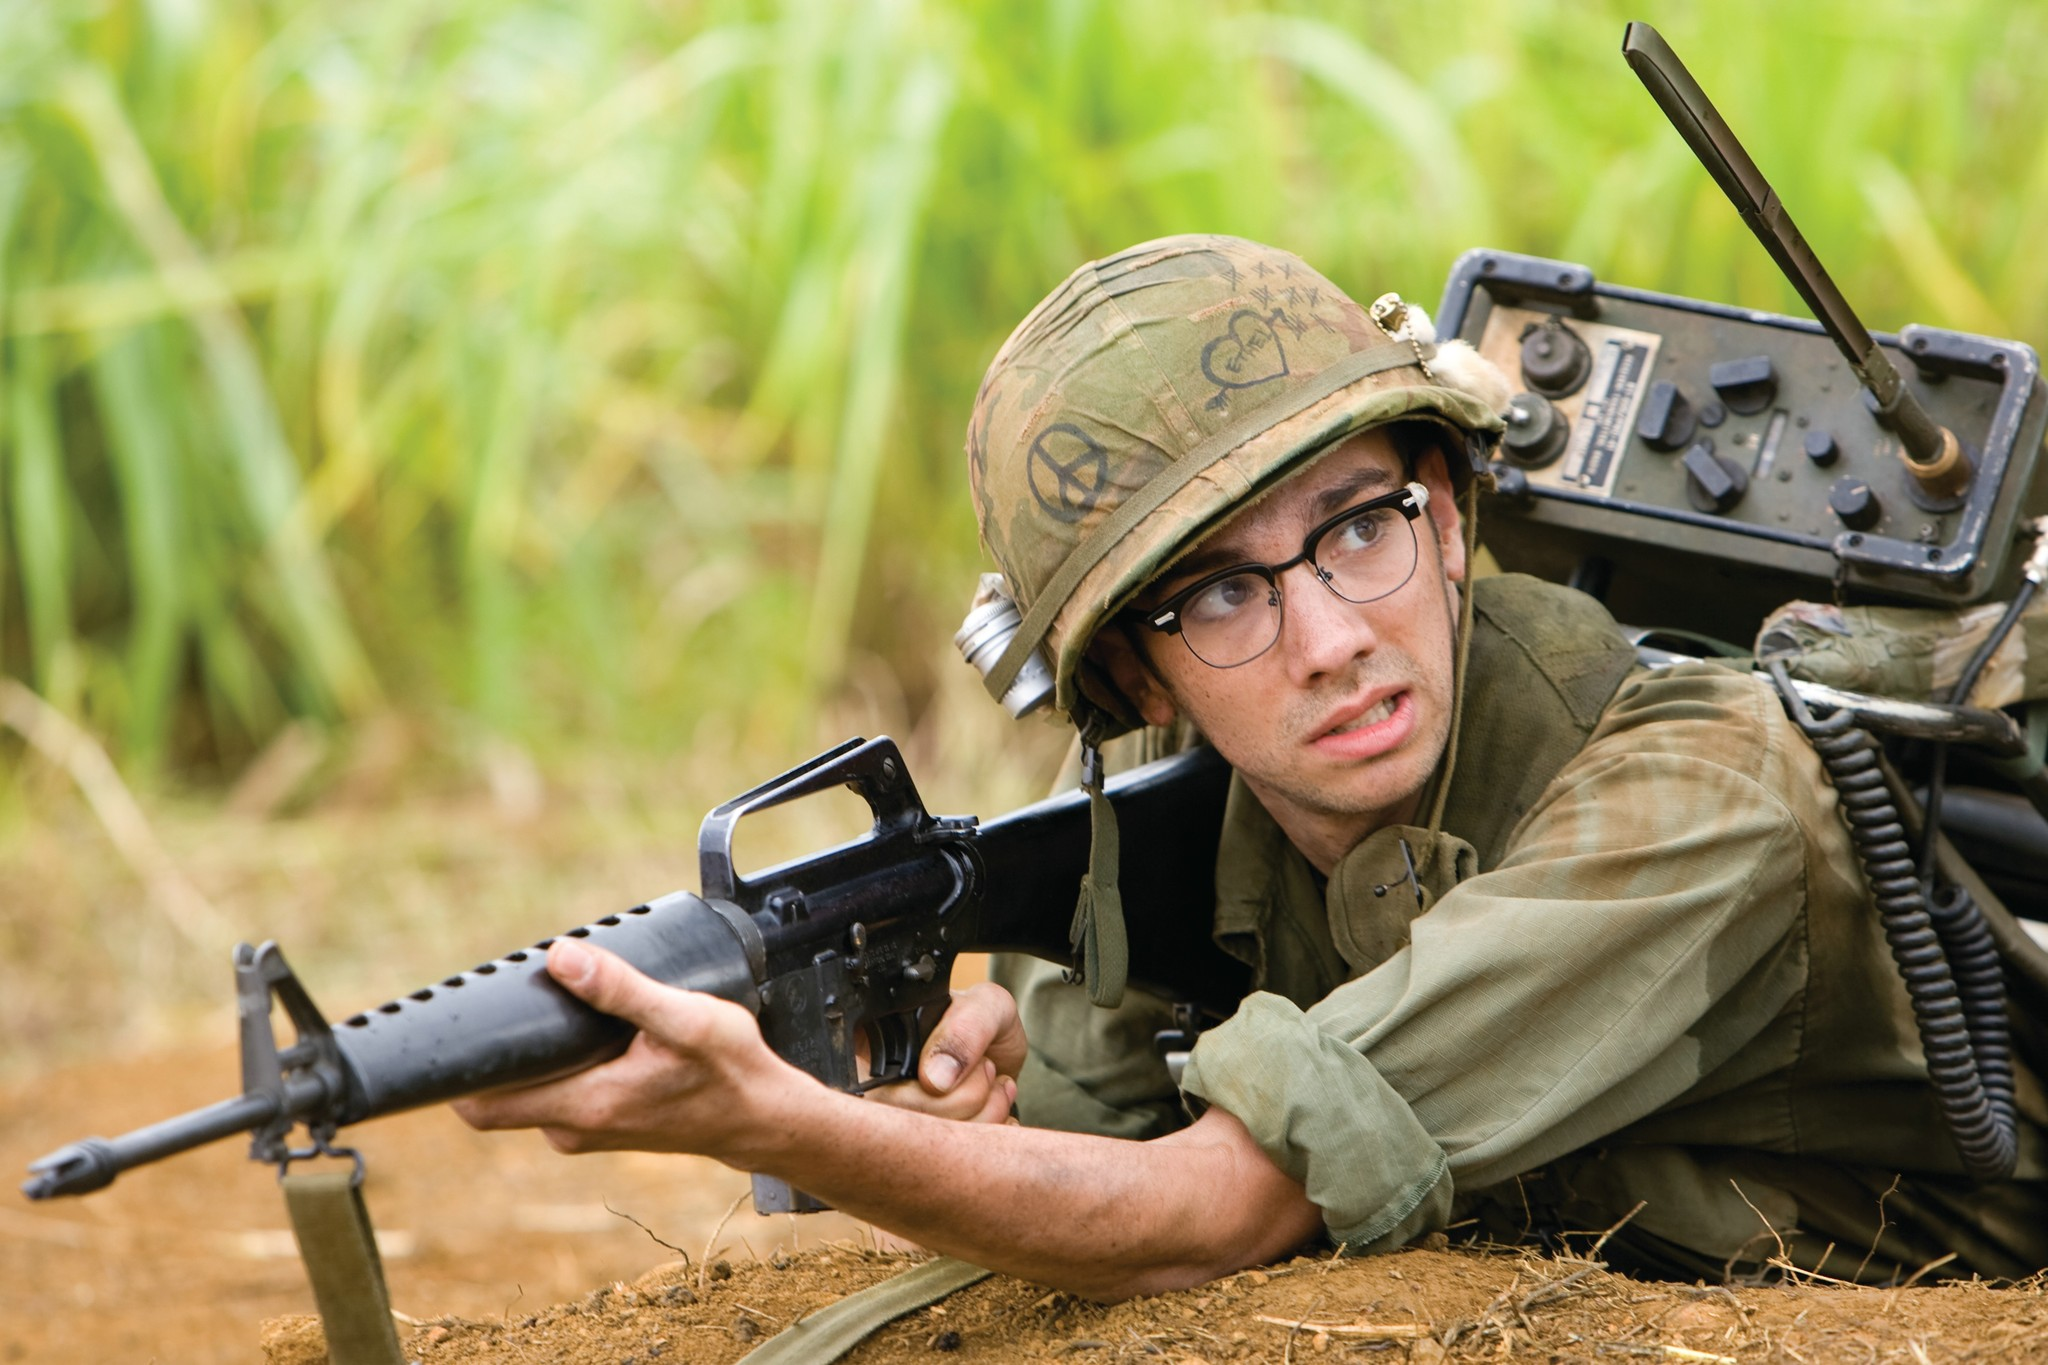 Jay Baruchel in Tropic Thunder (2008)